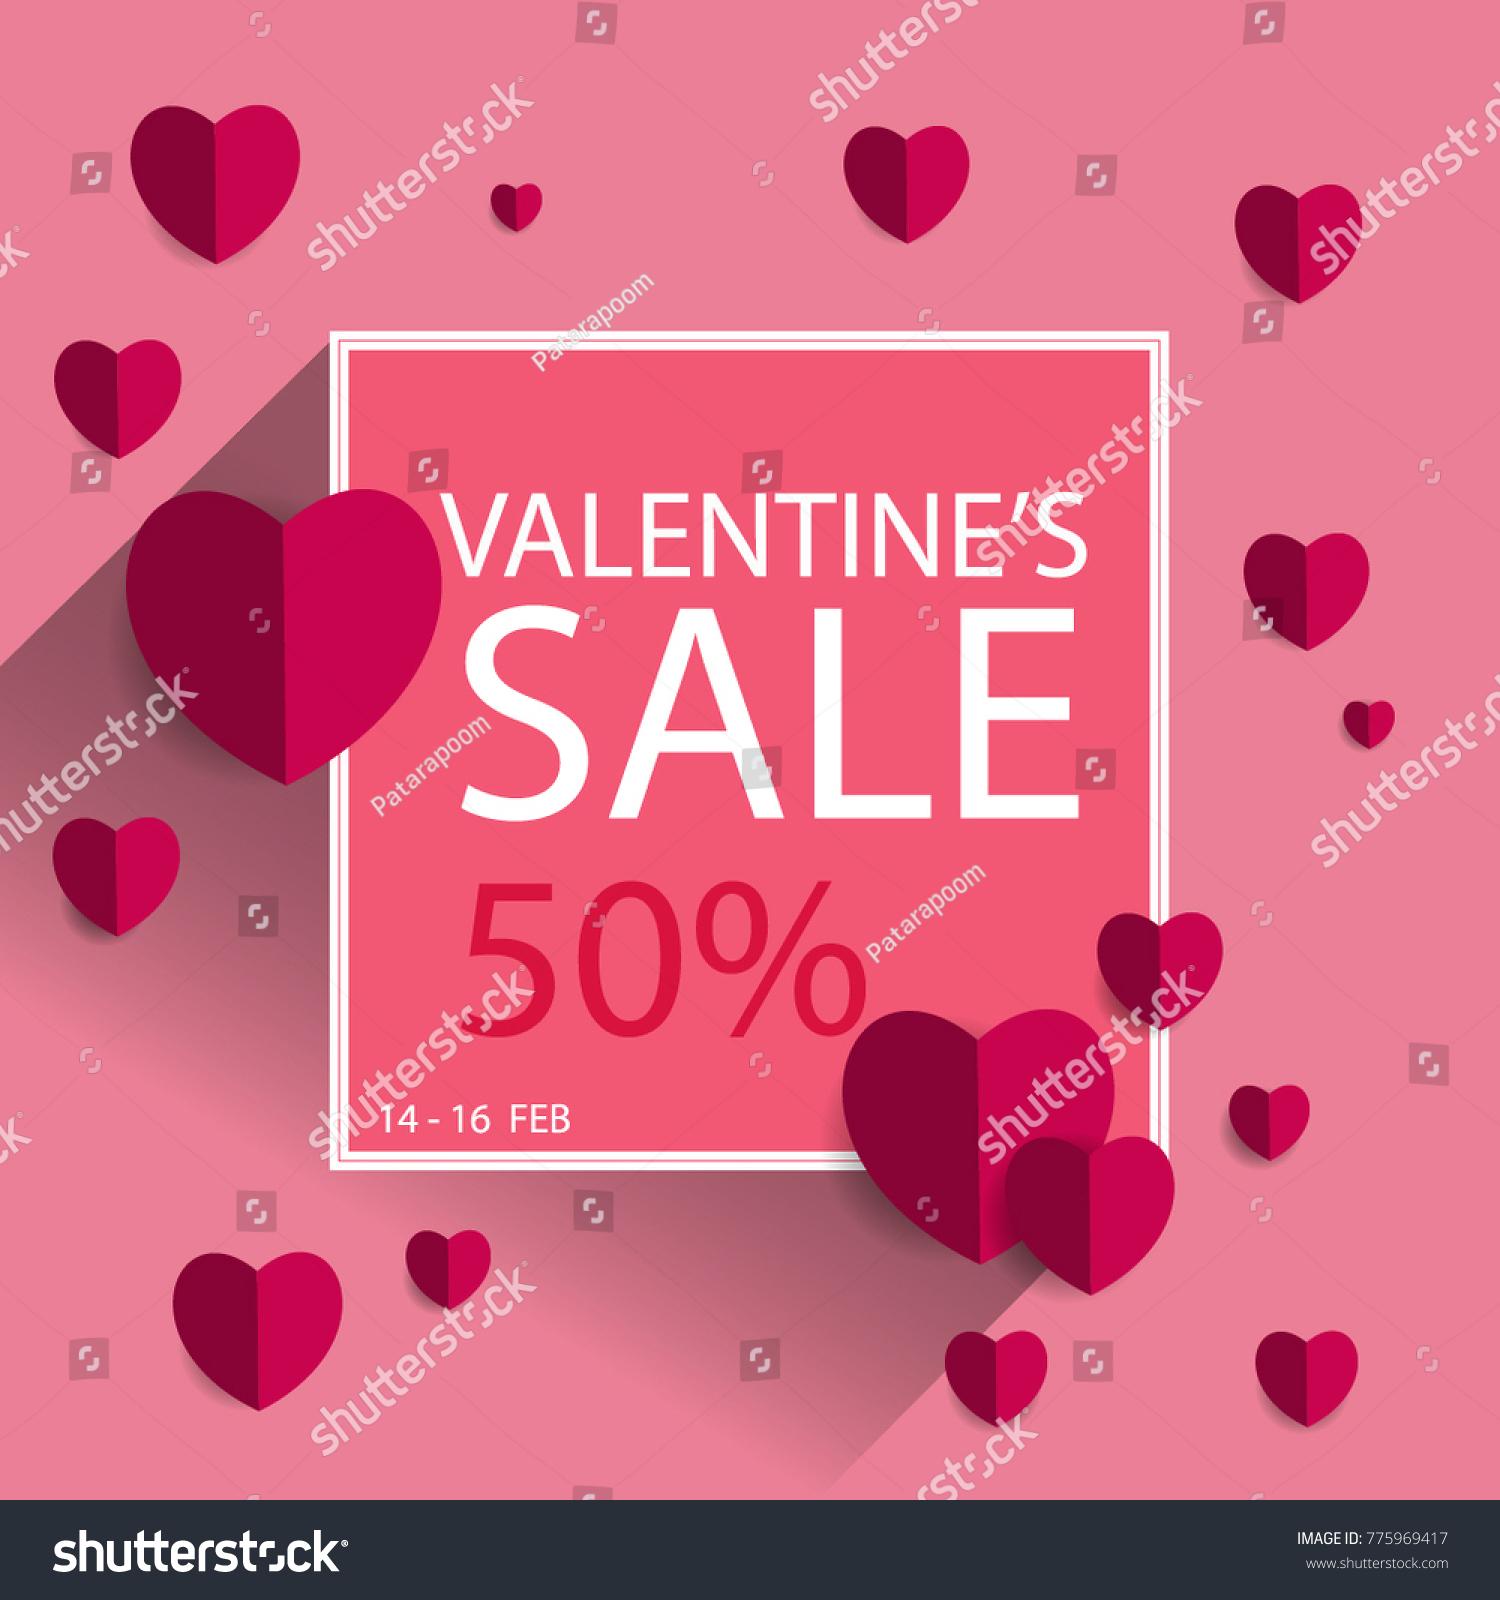 vector illustration valentines day sale banner stock vector 775969417 shutterstock